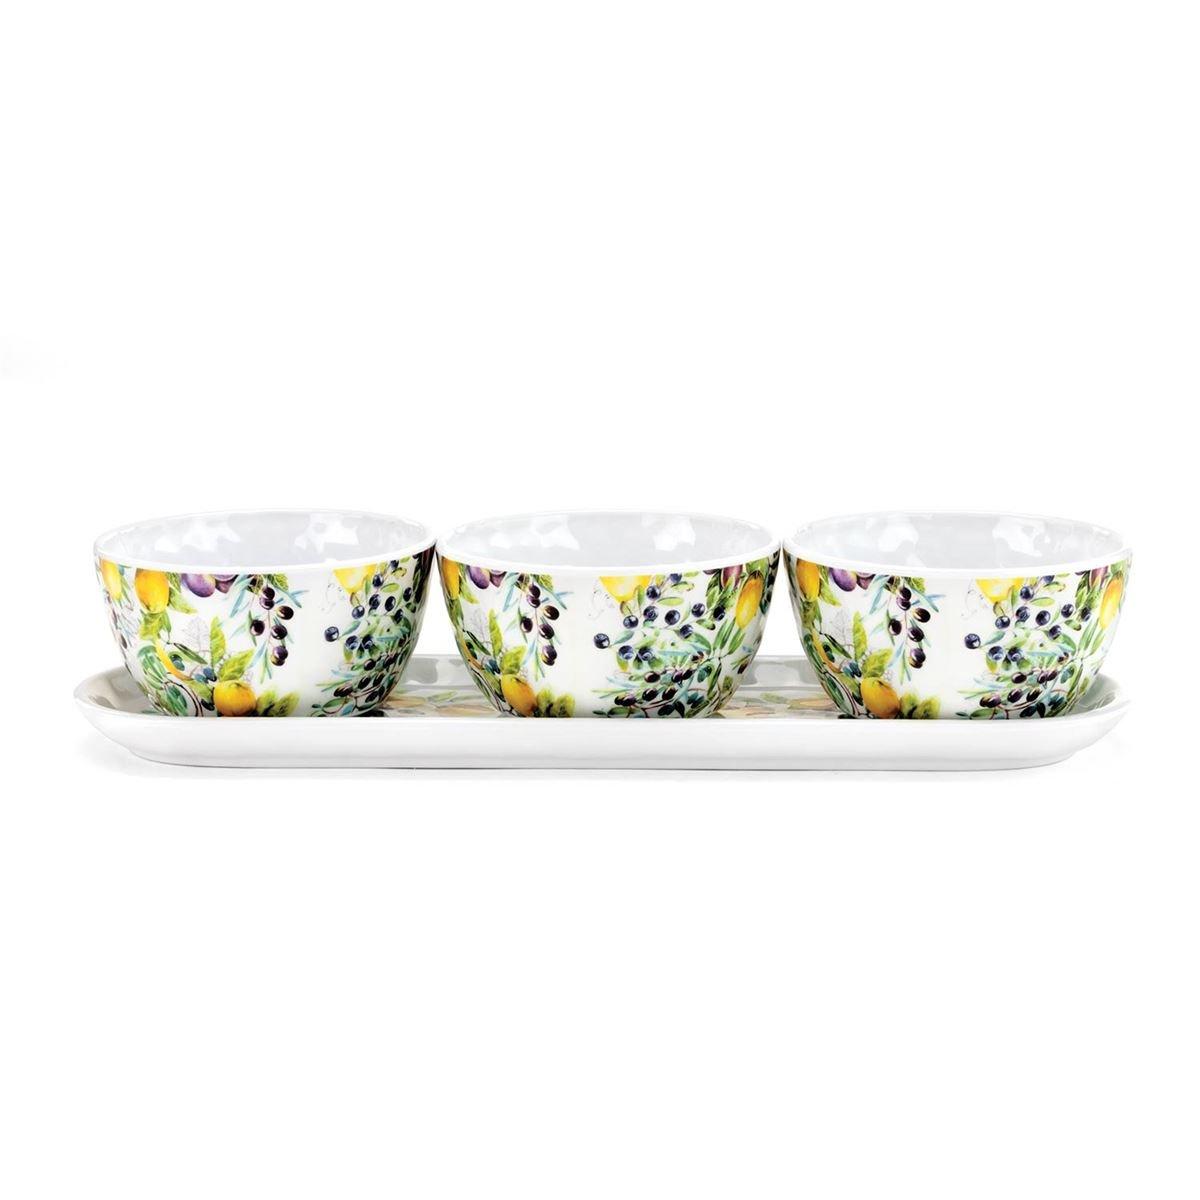 Michel Design Works Melamine Serveware Condiment Set, Tuscan Grove